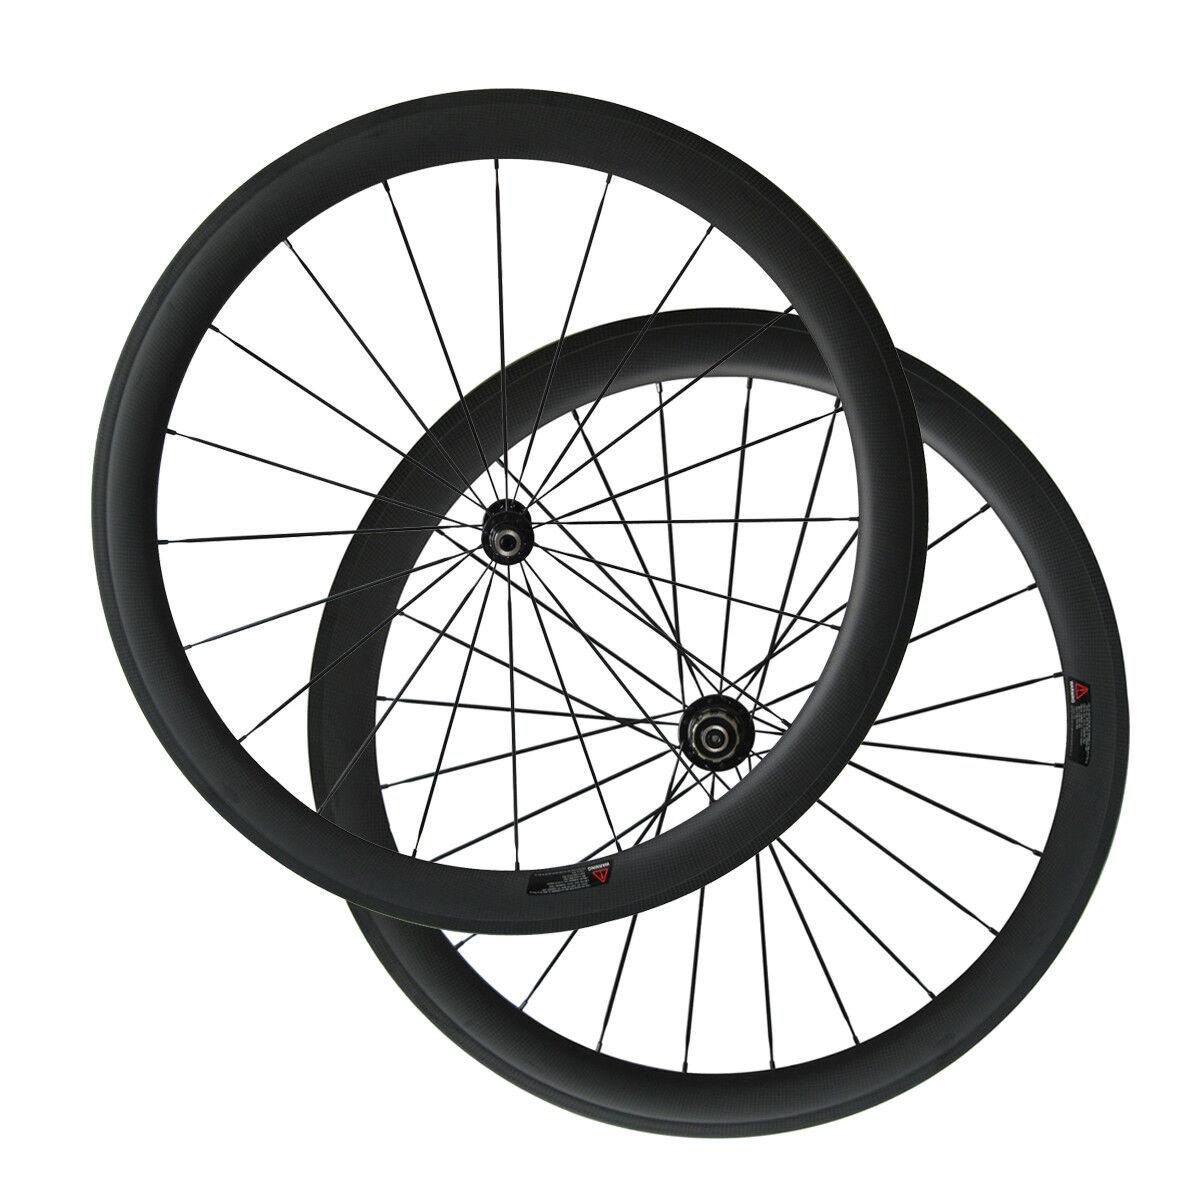 Road Bike Wheelset 700C Clincher 50mm Depth 25mm Width 20 24 Holes Carbon Wheels